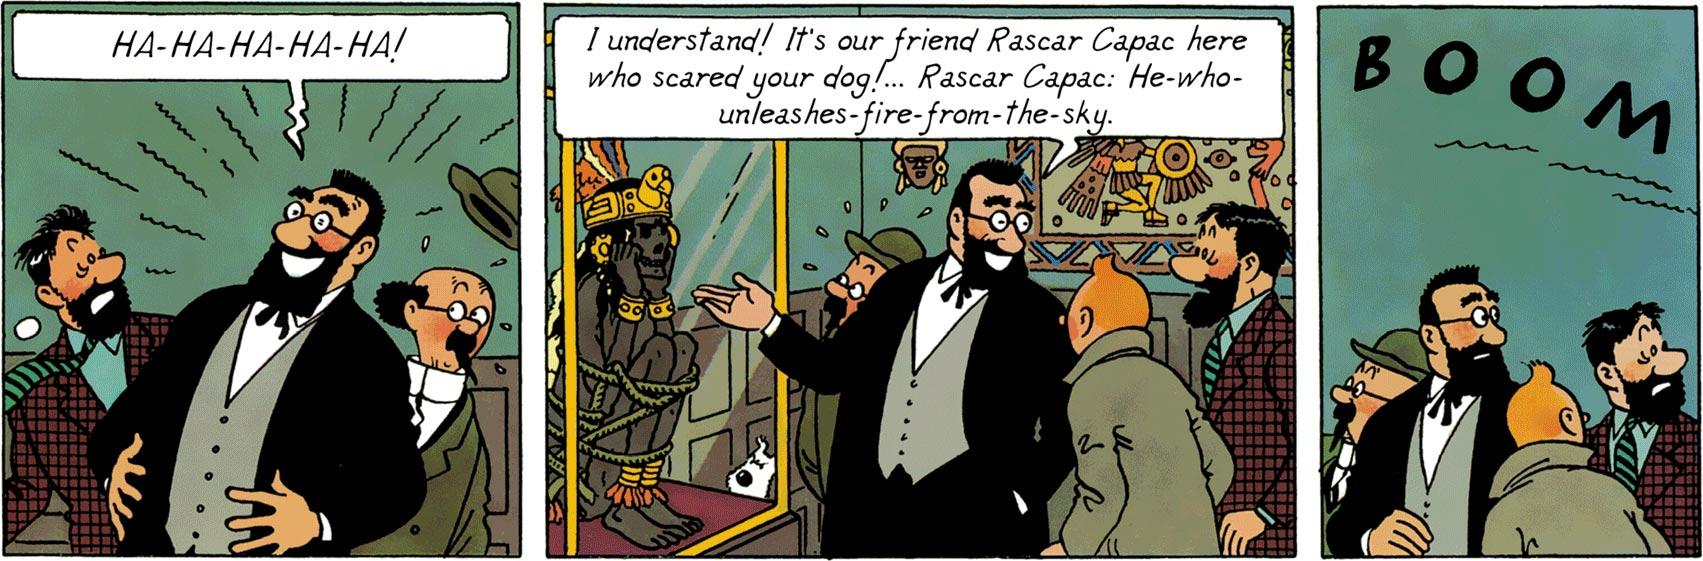 Tarragon presents the mummy, Inca king, Rascar Capac